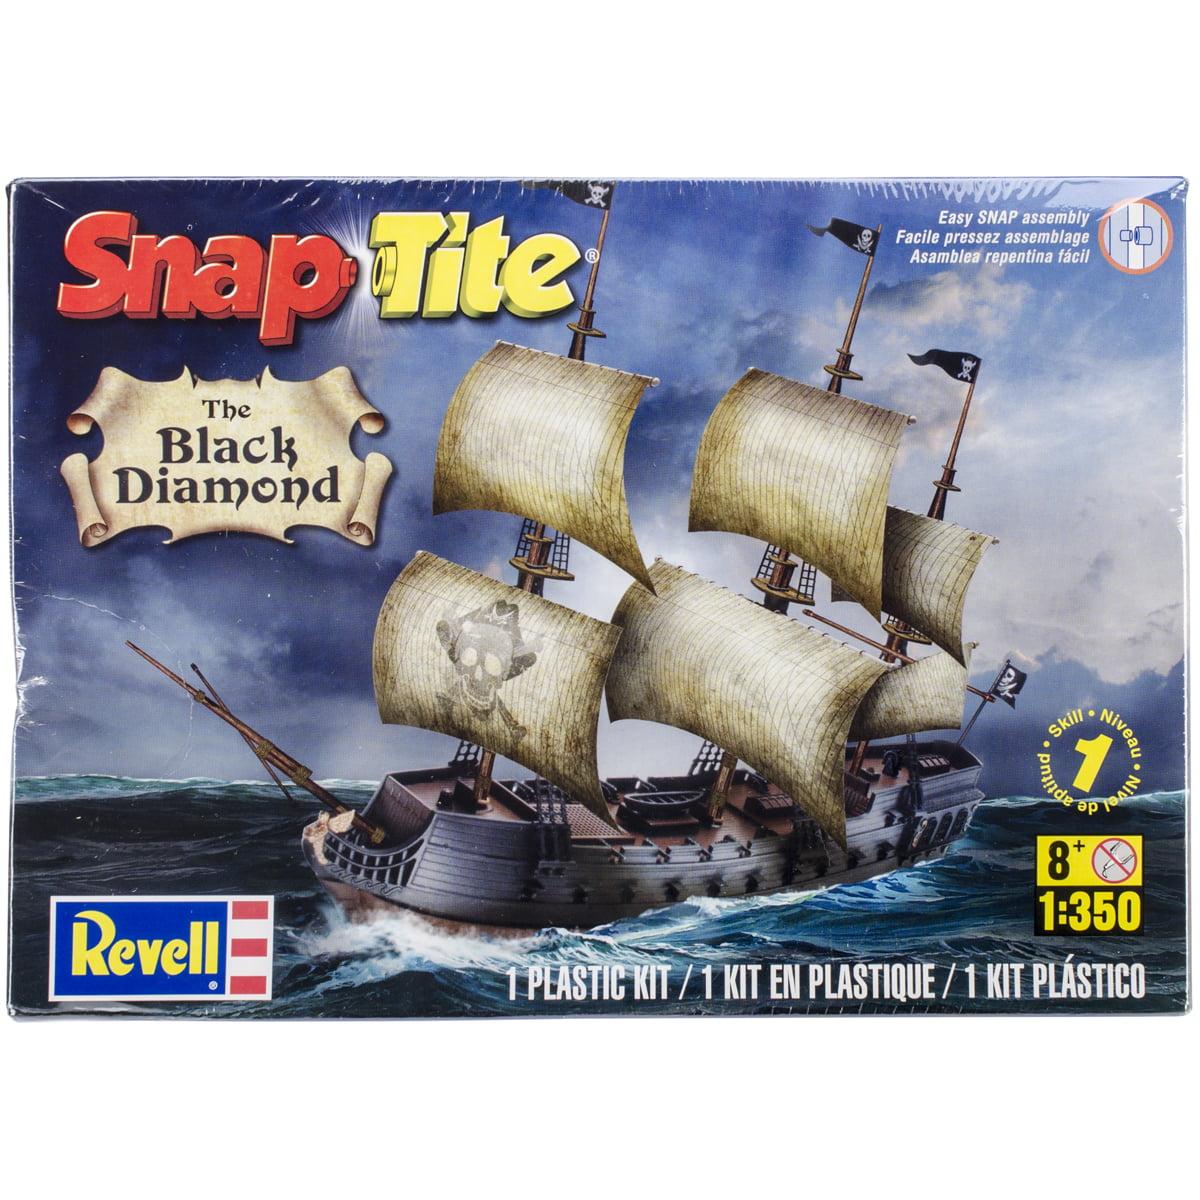 SnapTite Plastic Model Kit Black Diamond Pirate Ship 1:350 by Revell